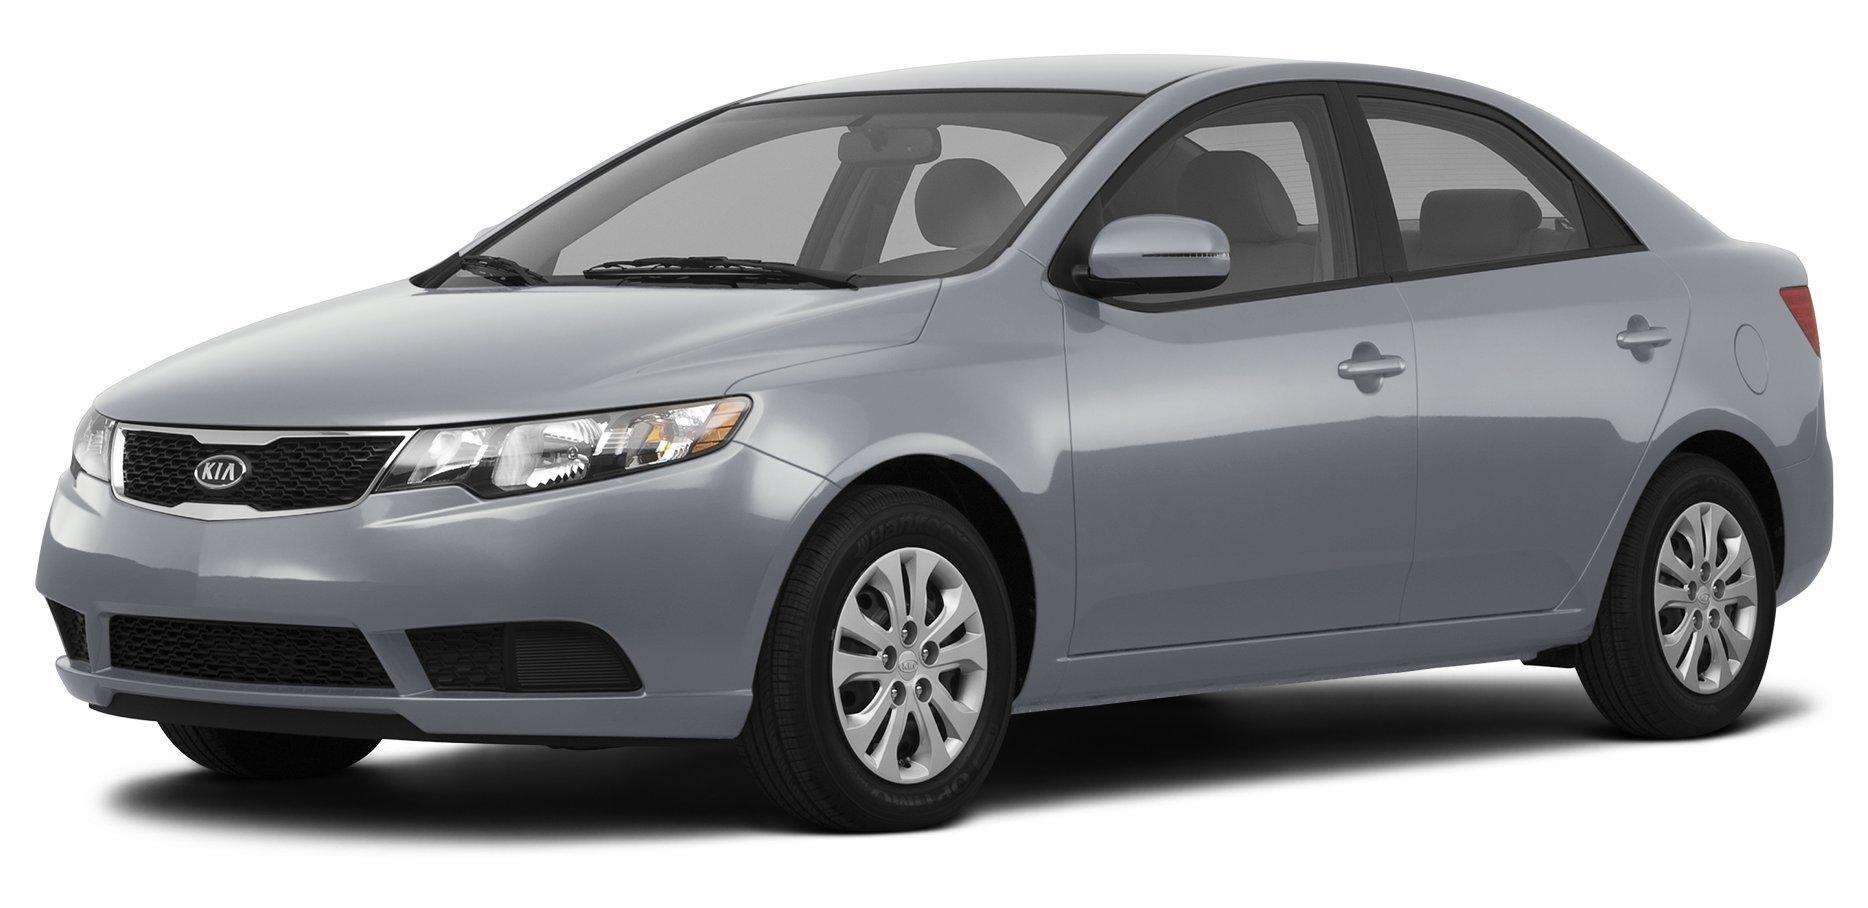 Amazon 2011 nissan sentra reviews images and specs vehicles 2011 kia forte ex 4 door sedan automatic transmission vanachro Choice Image